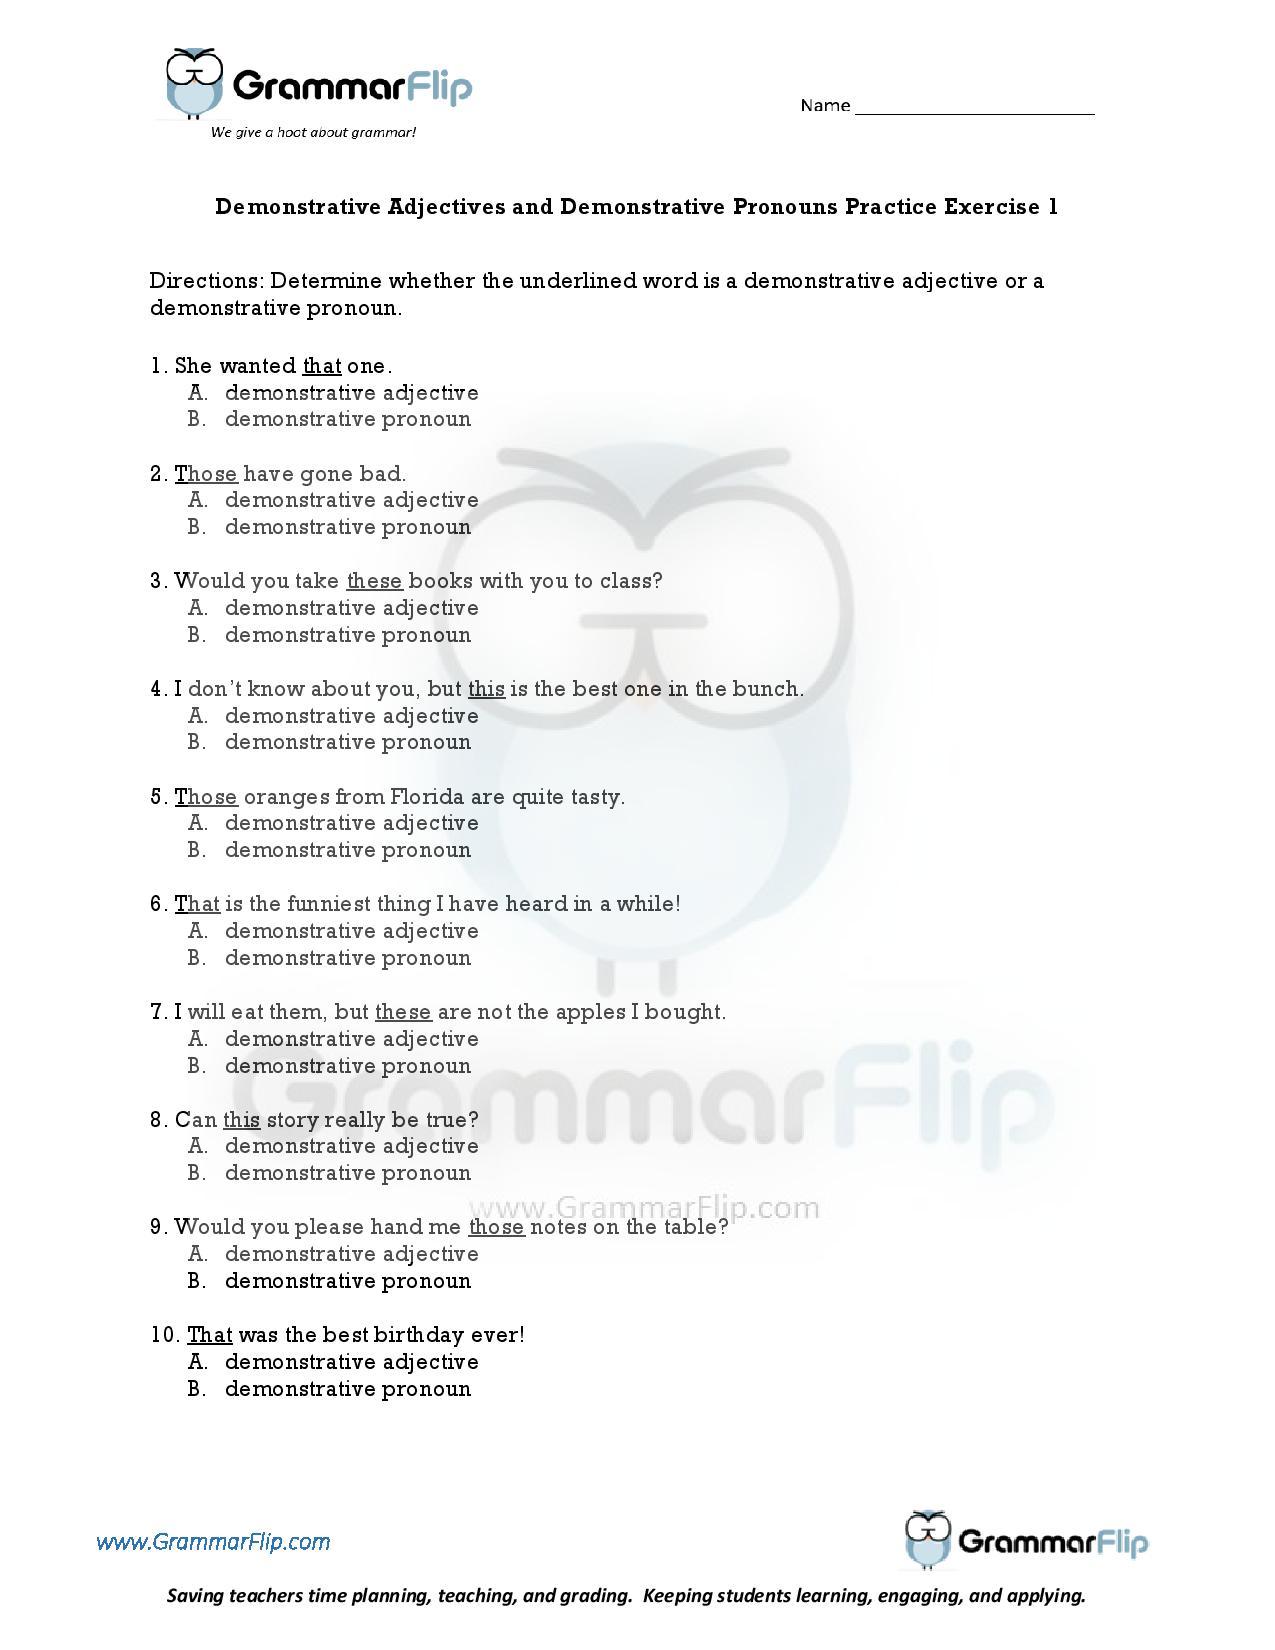 Demonstrative Adjectives And Demonstrative Pronouns